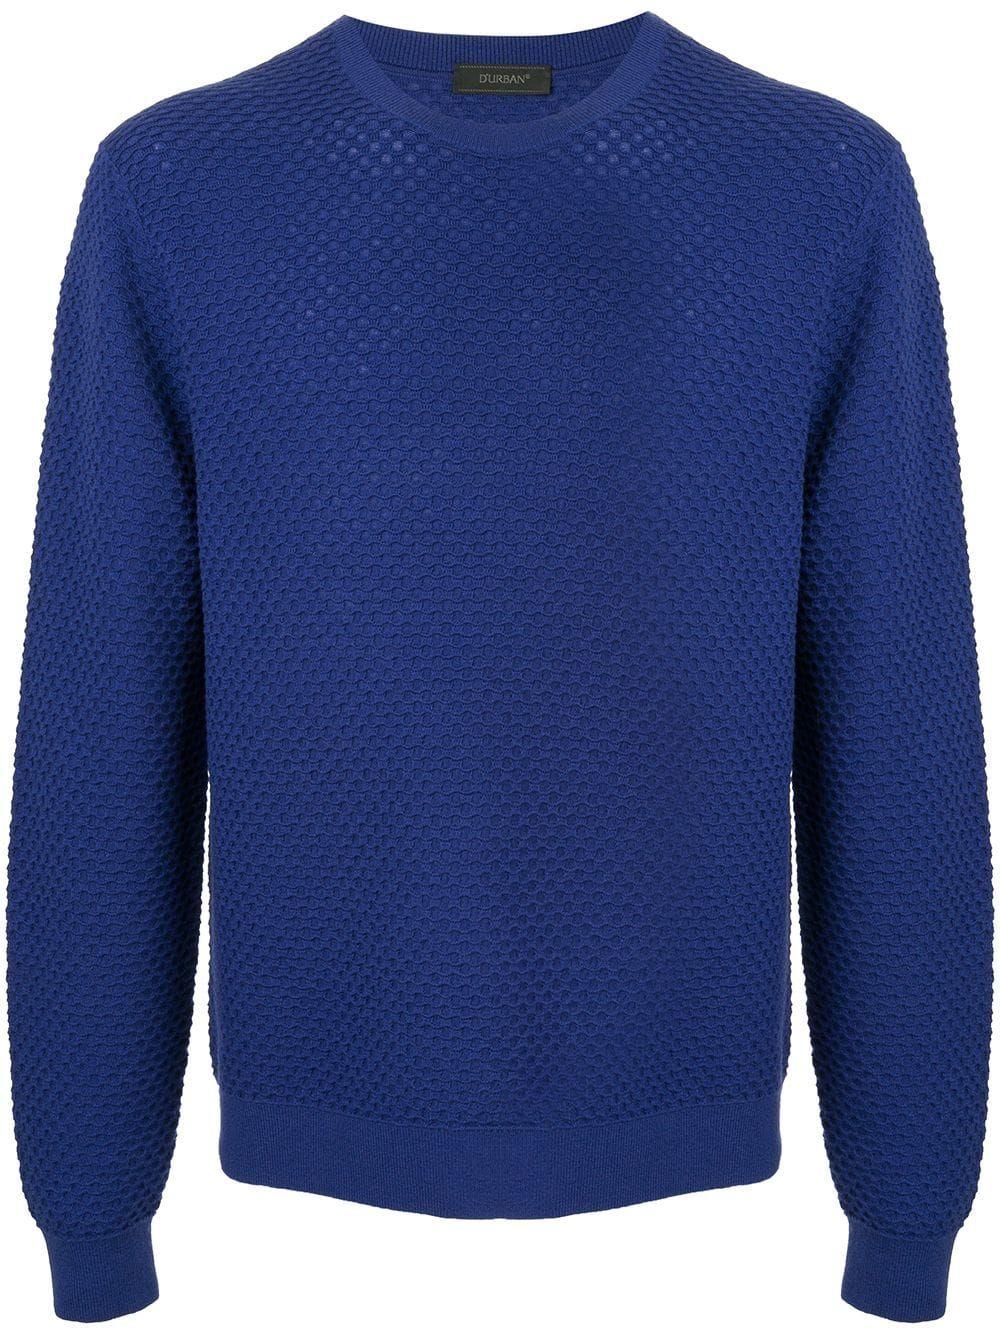 Neck Round D'urban Jumper durban Blue cloth g4q5H4